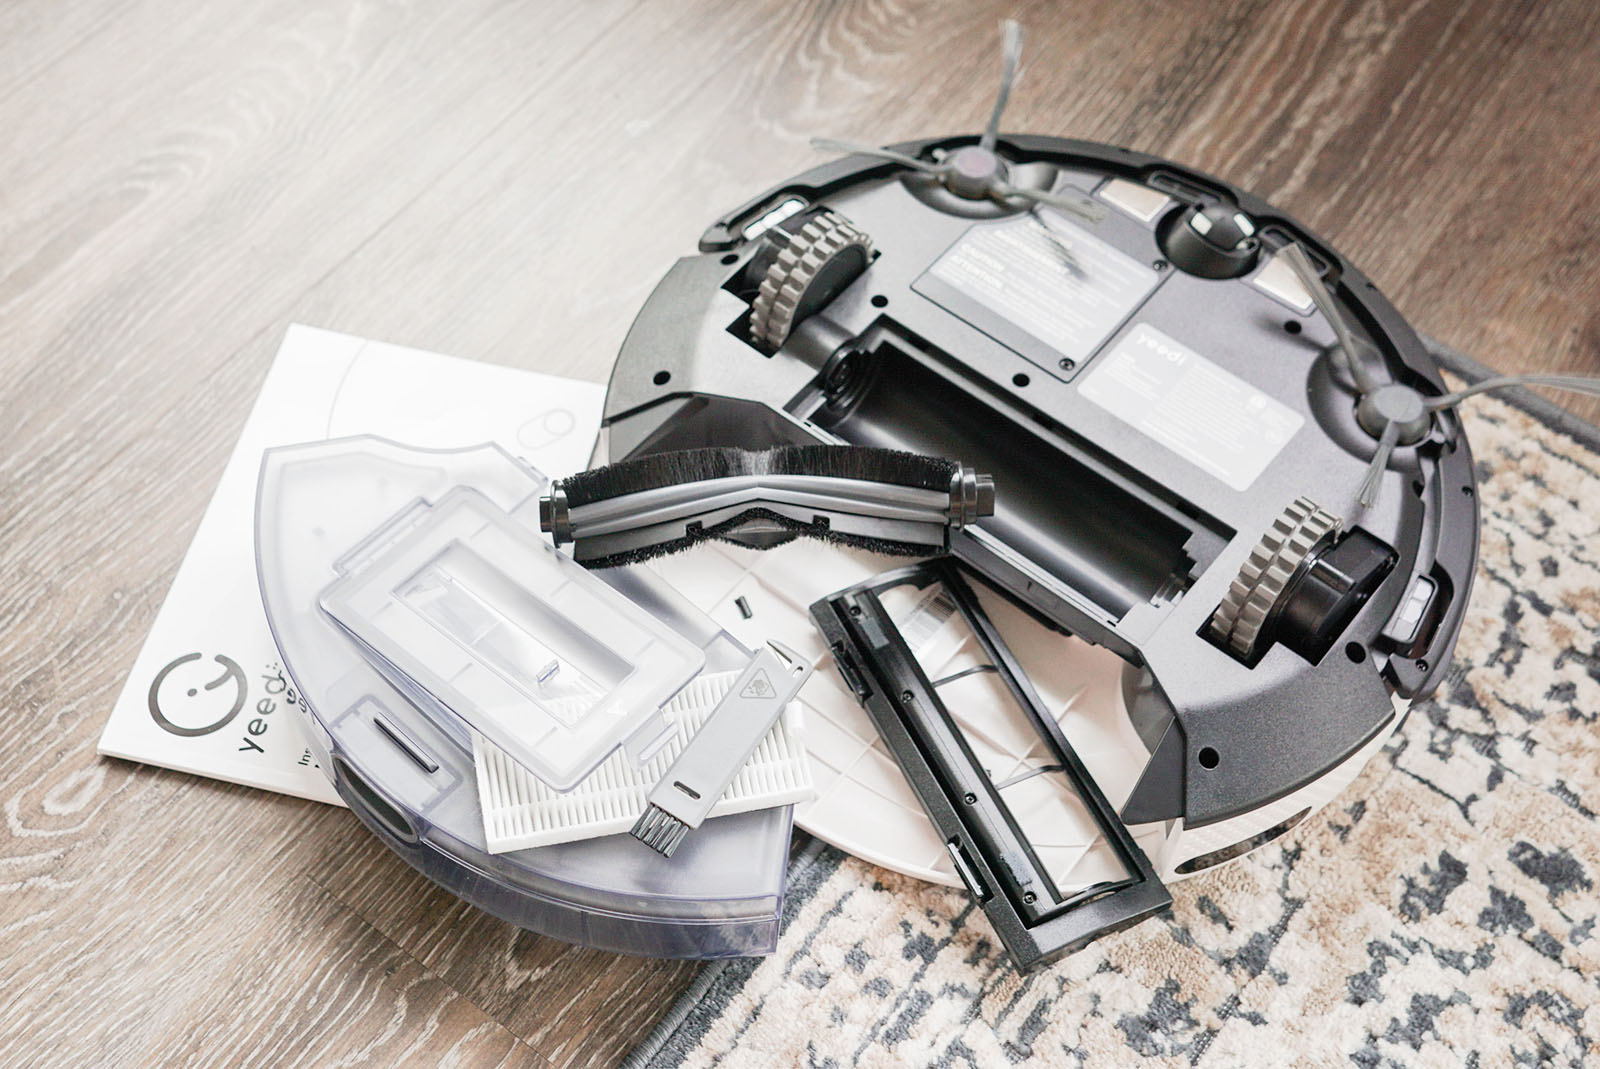 The underside of the Yeedi K650 robot vacuum